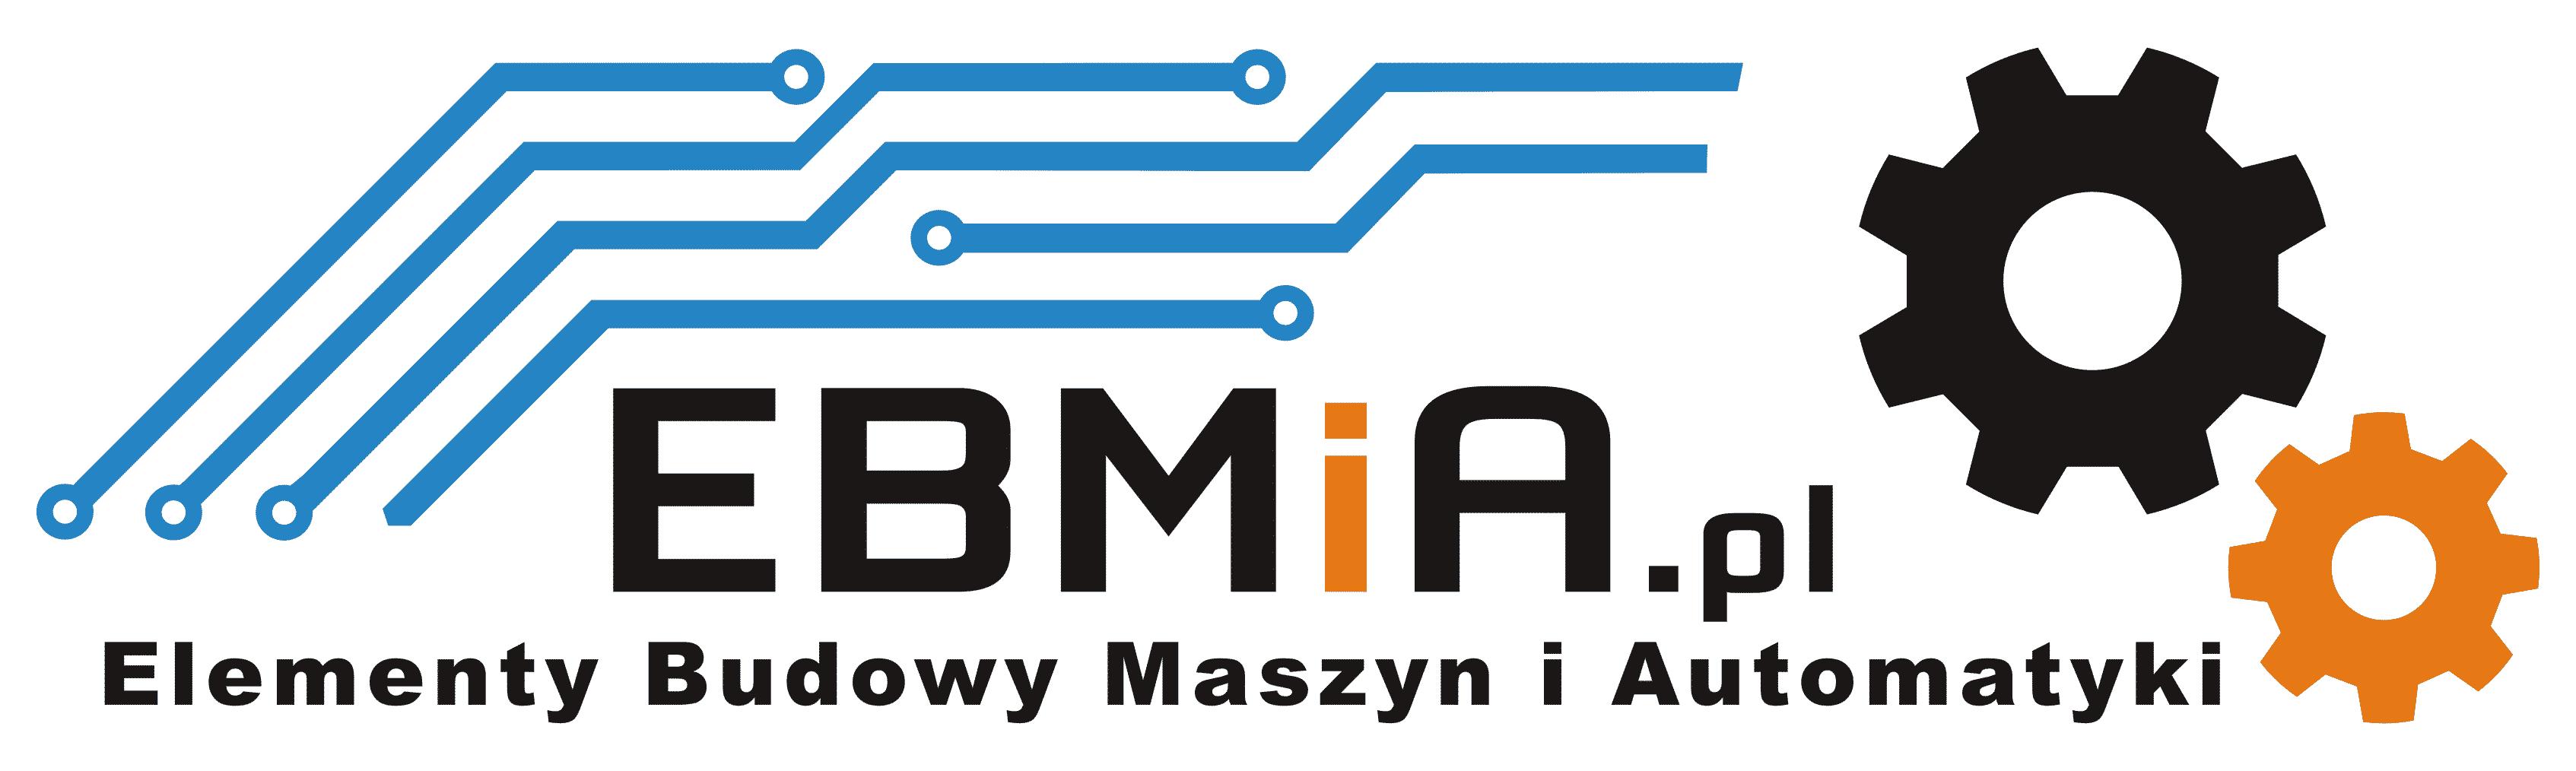 ebmia_pl_logo